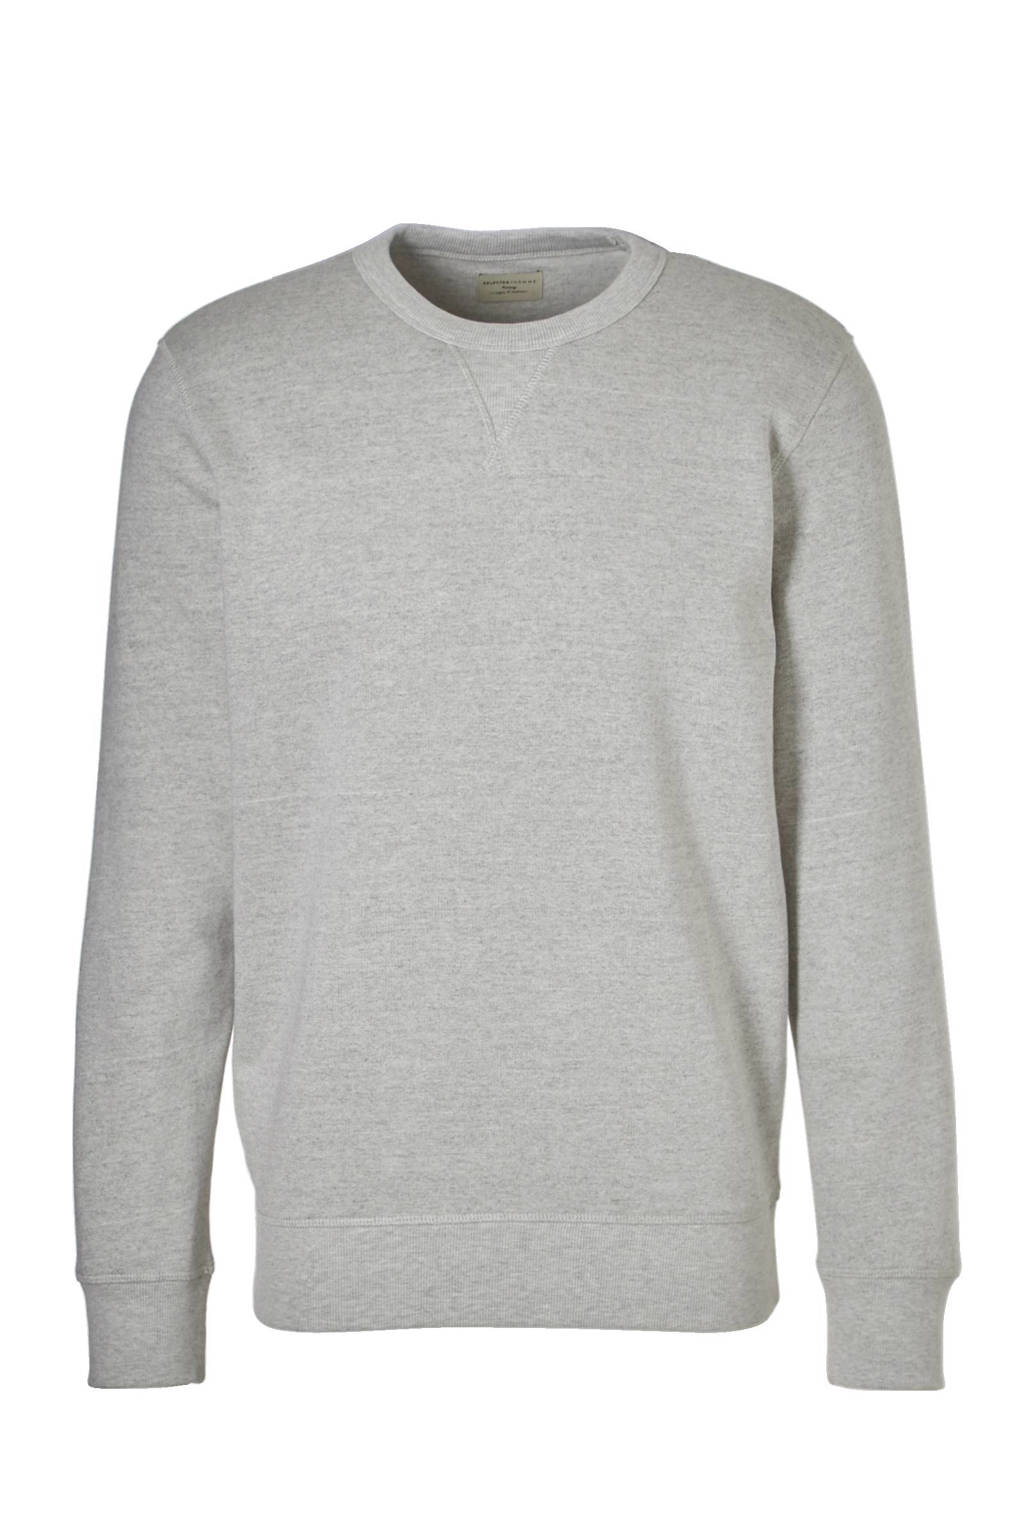 SELECTED HOMME Simon sweater, Lichtgrijs